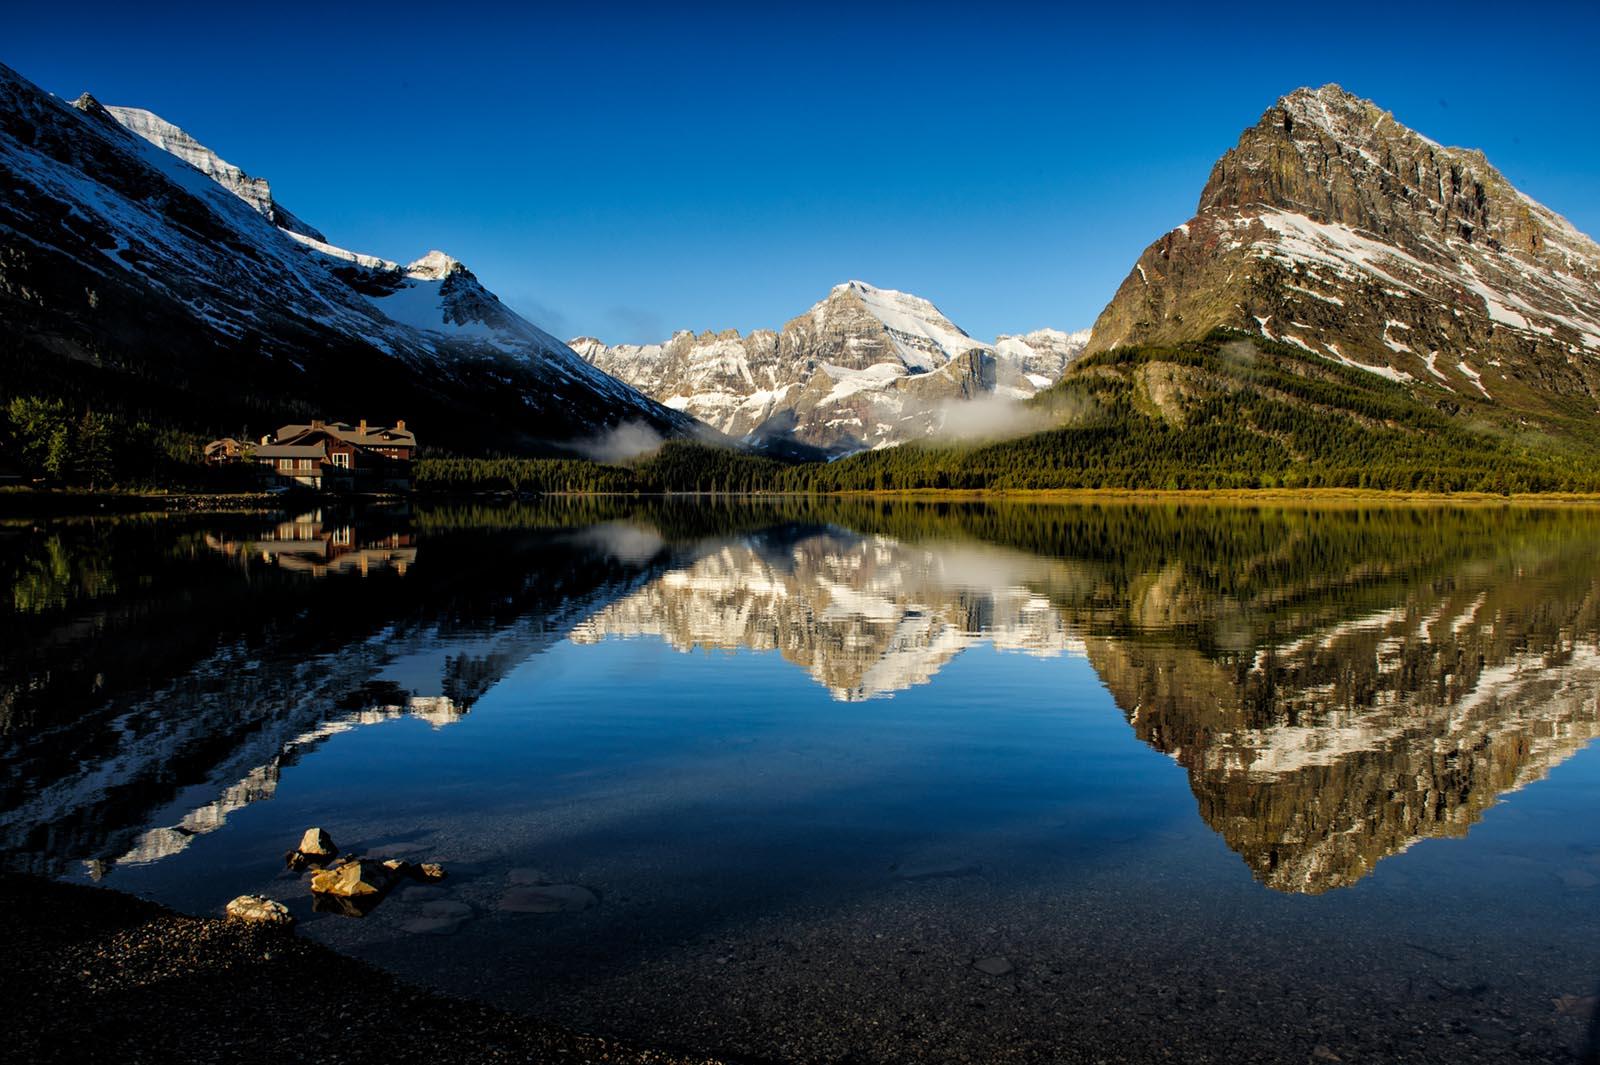 swift current lake, glacier national park, montana, sunrise, vincent mistretta, images, photography, landscape, nature, many glacier hotel, photo